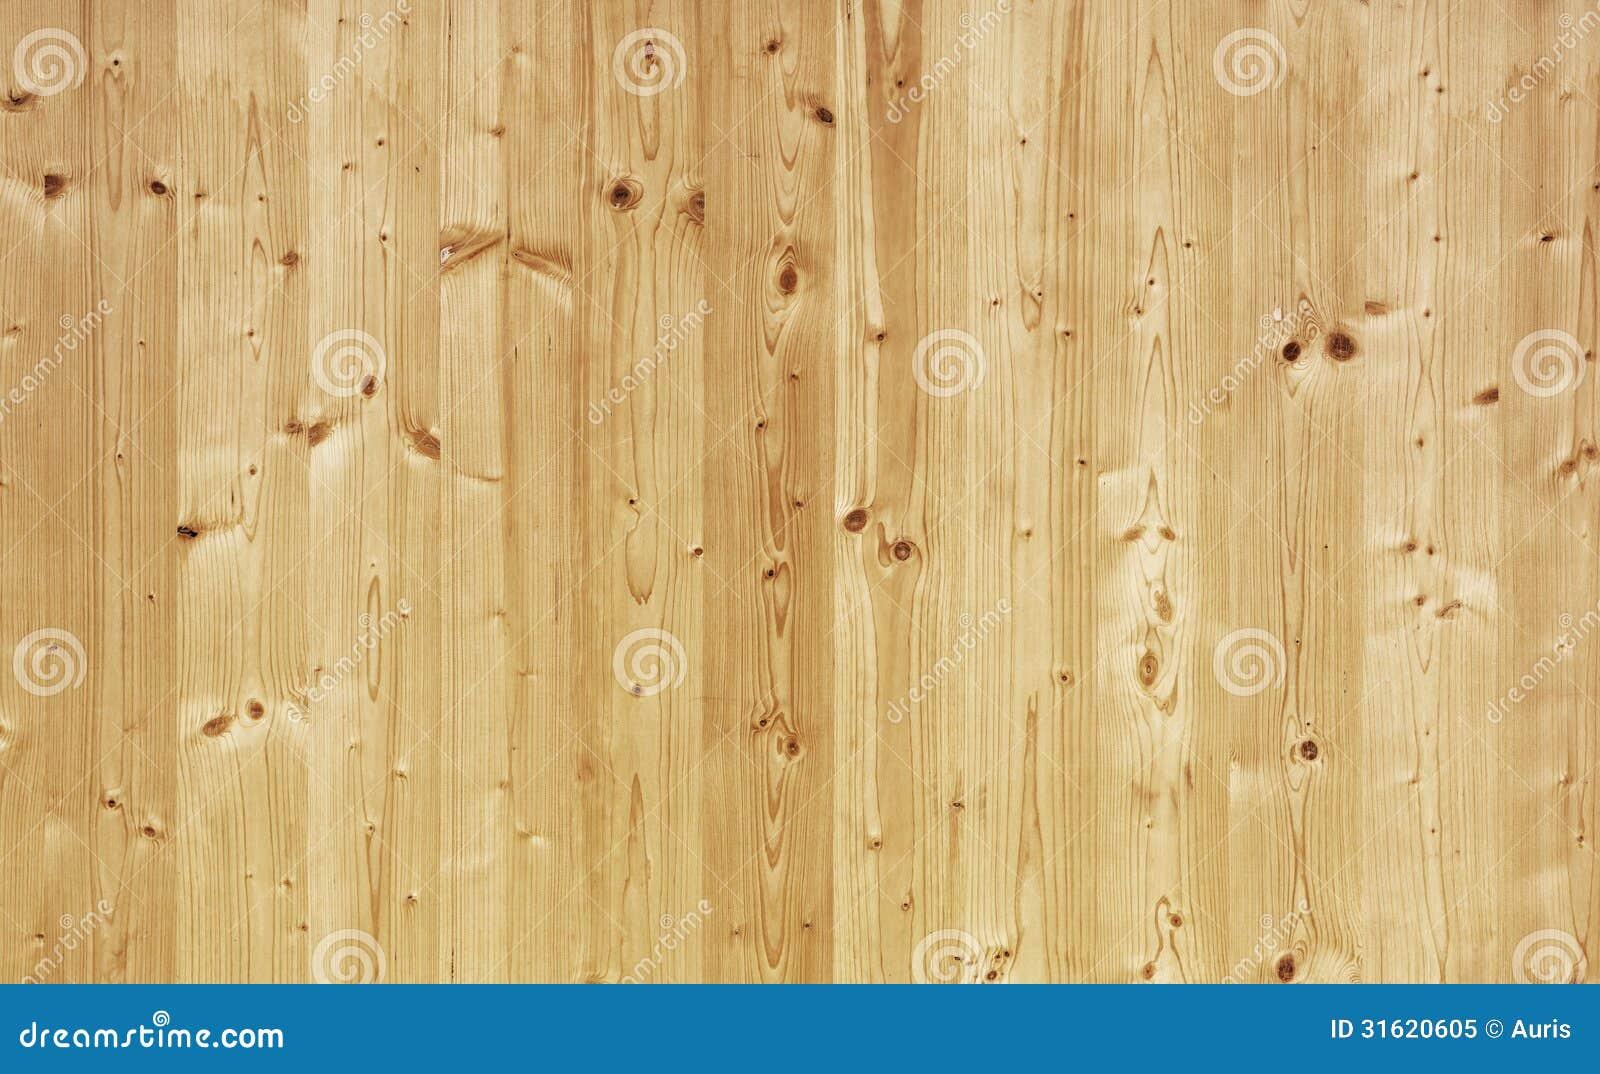 Textura del panel de madera de pino foto de archivo libre - Madera de pino ...